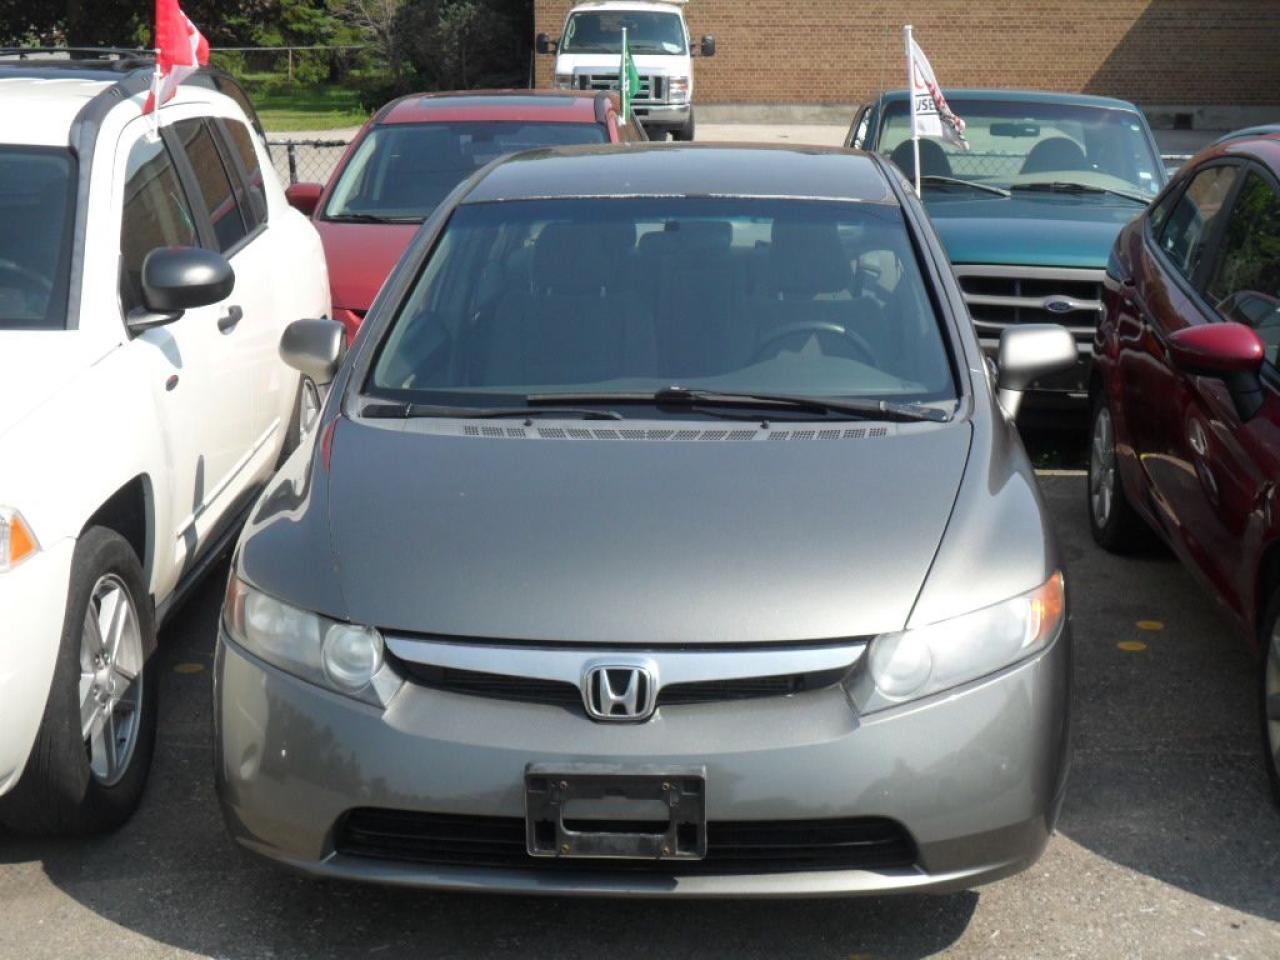 Photo of Gray 2008 Honda Civic